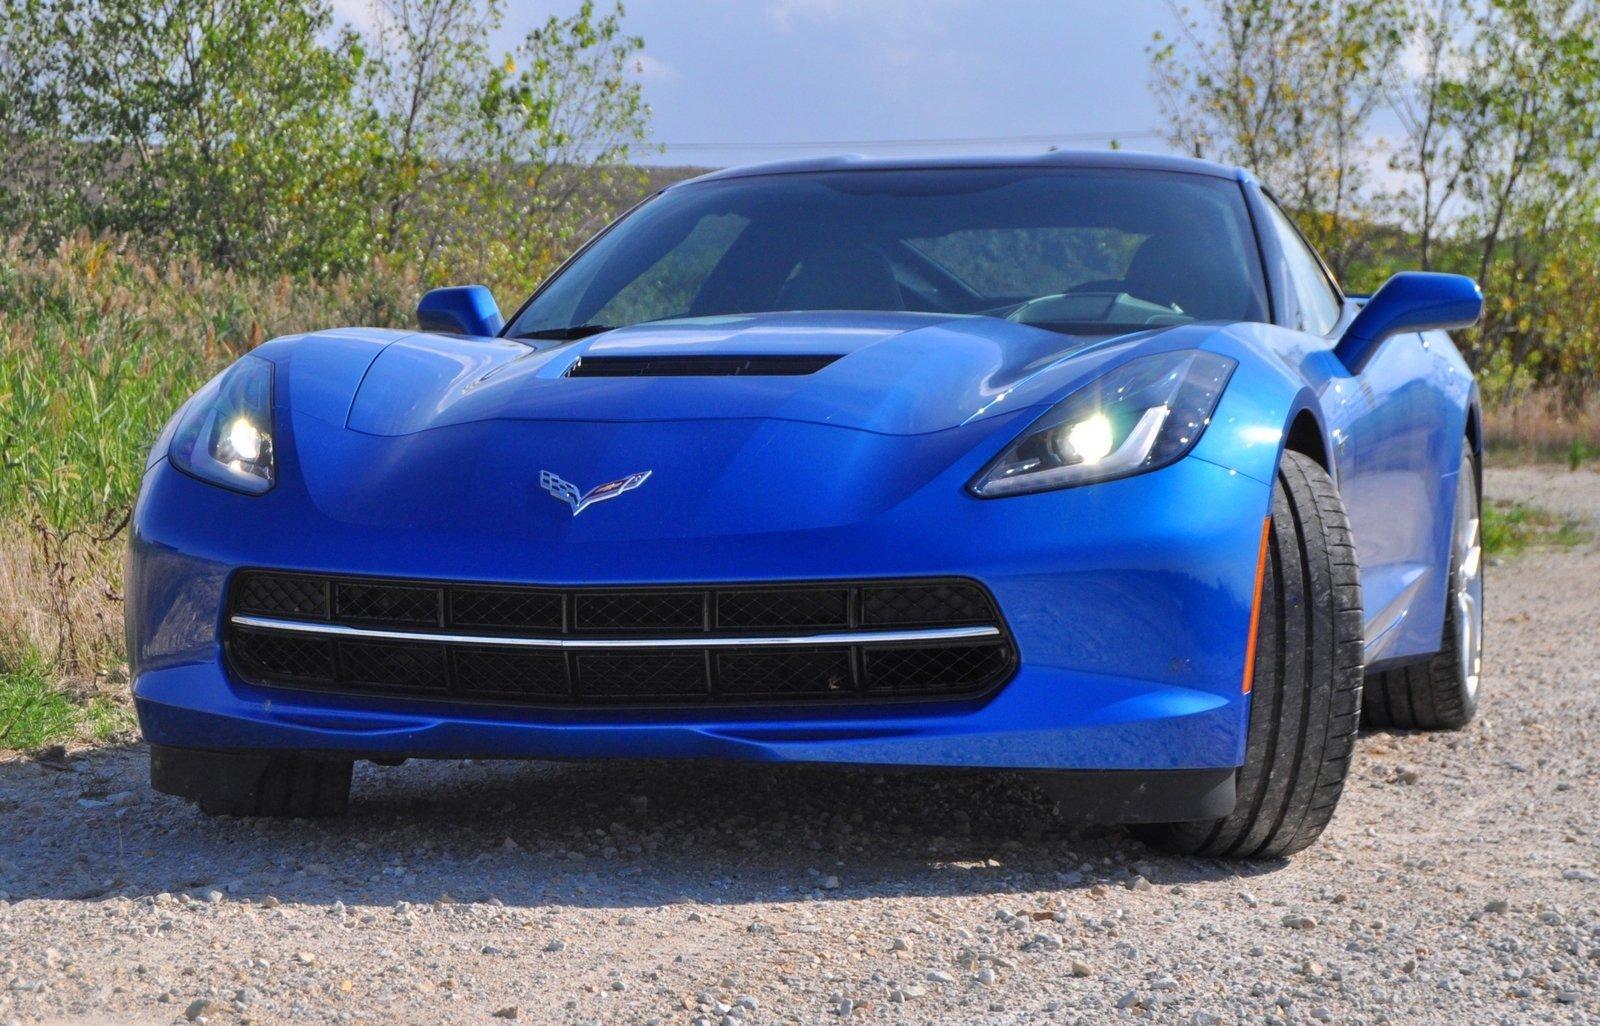 1lt vs 2lt on 2015 corvette autos post. Black Bedroom Furniture Sets. Home Design Ideas